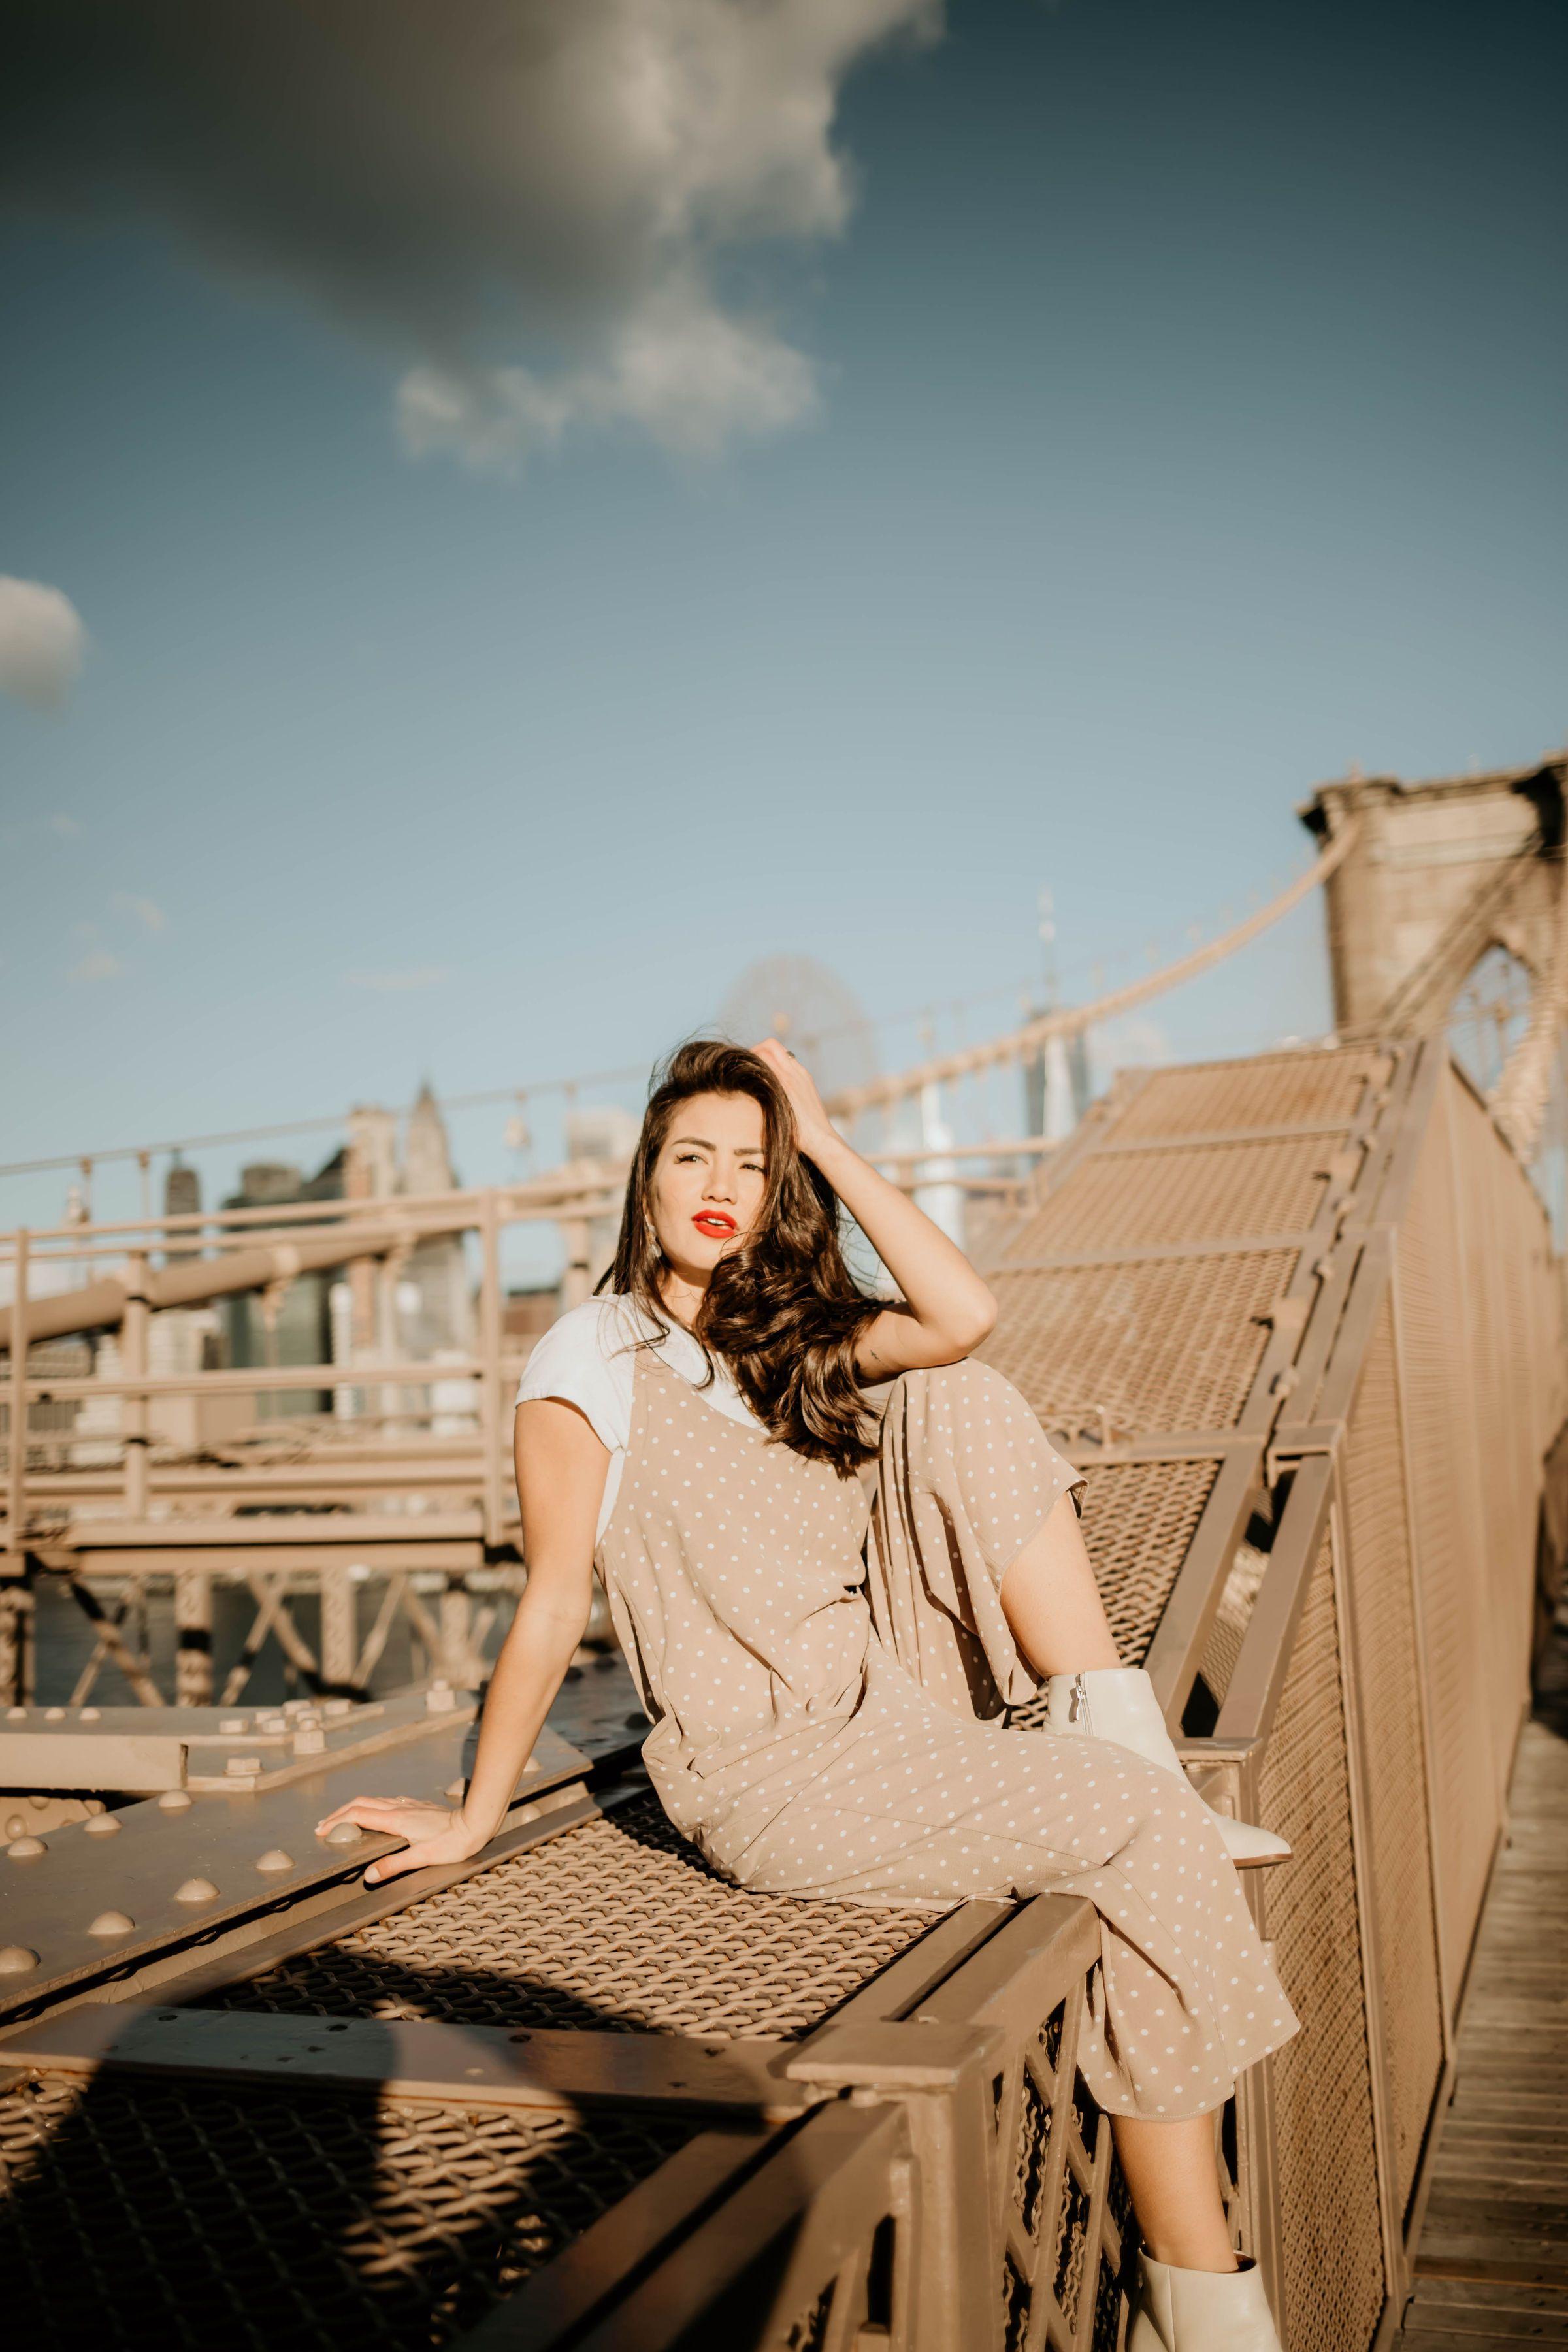 5f7e3d35c9 Spring Wardrobe | Brooklyn Bridge | New York City | Polka Dot | Jumpsuits |  Overalls | White Bootie | California Vibes | Caila Quinn | The Bachelor |  Travel ...